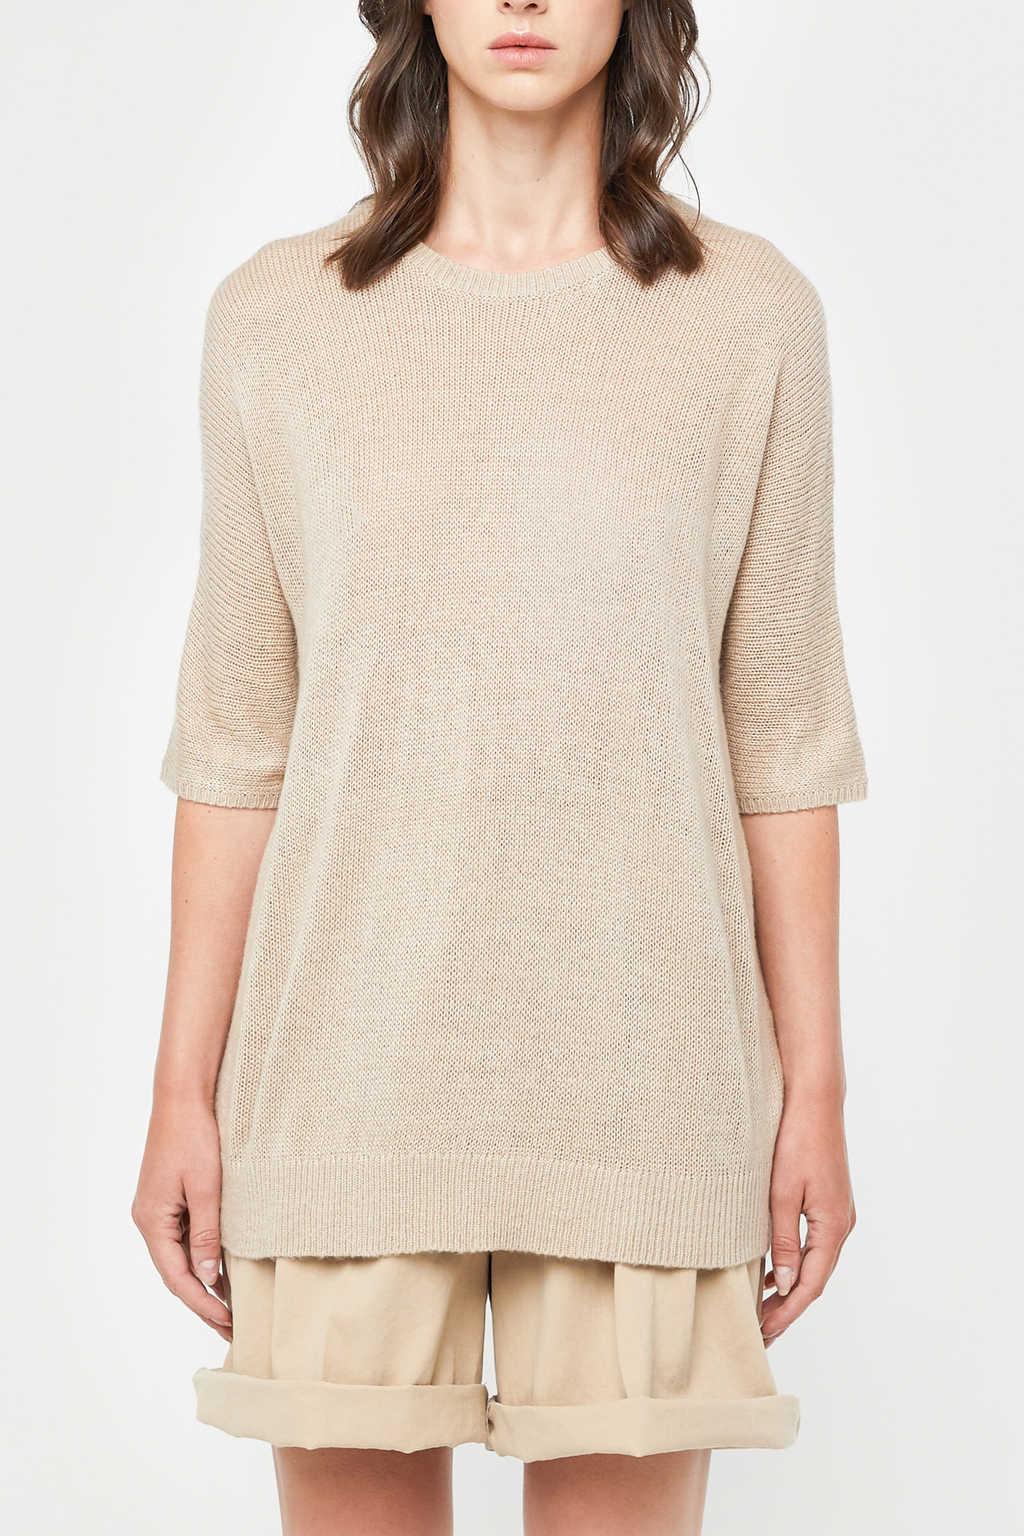 Sweater 3677 Beige 3